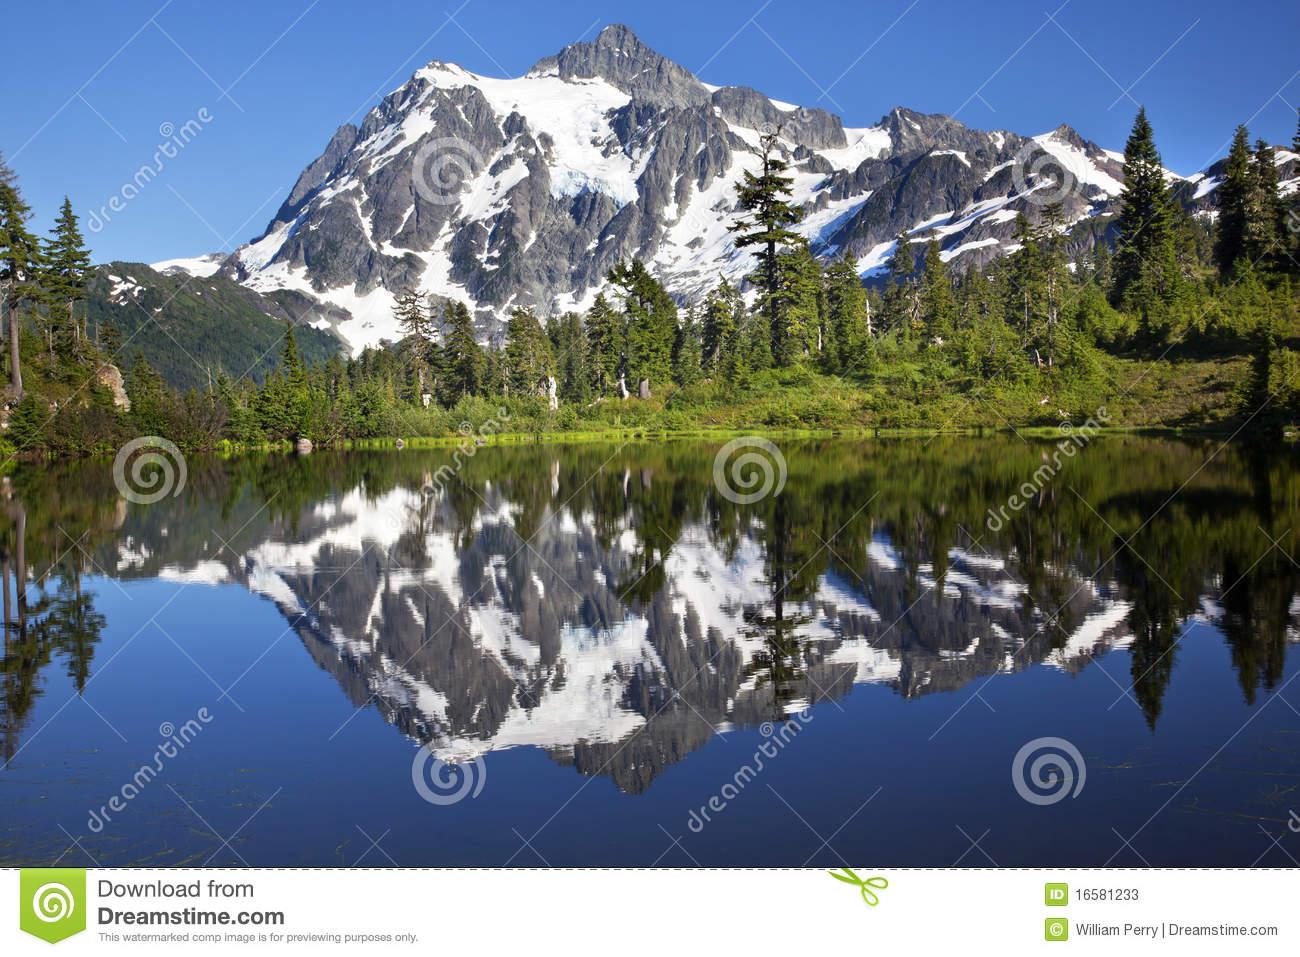 Mirror Reflection Lake Mount Shuksan Washington Stock Photos.